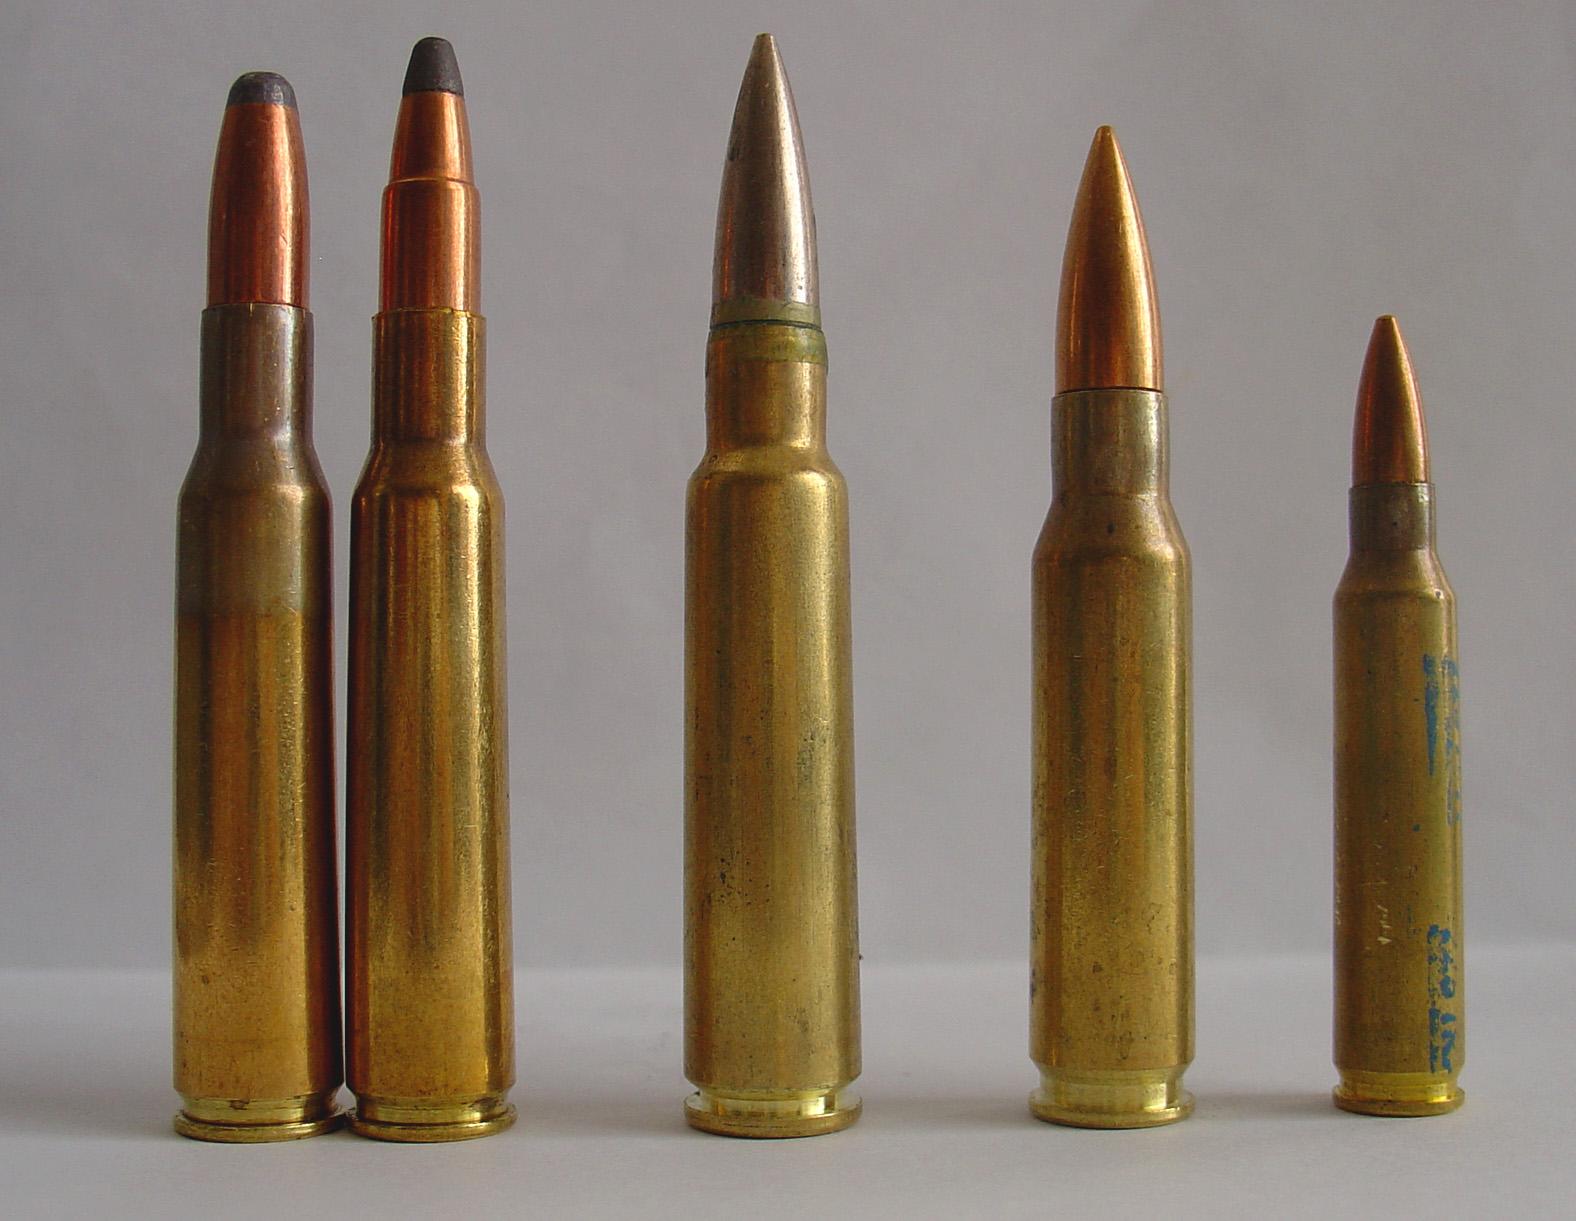 7×57mm Mauser - Wikipedia